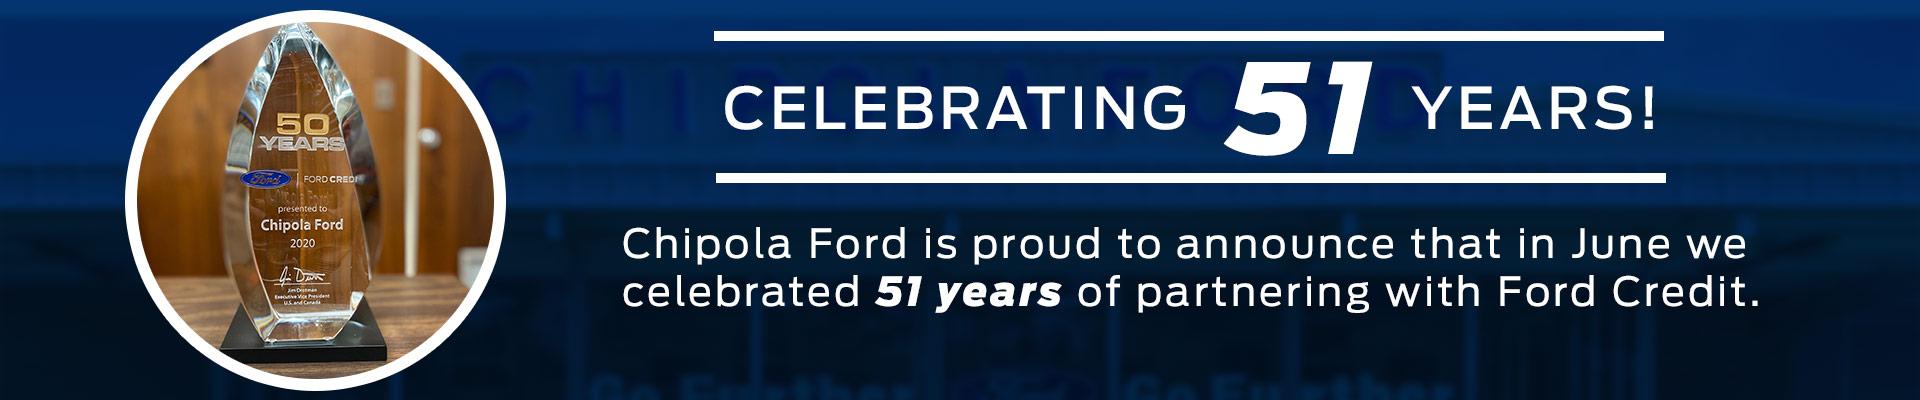 Ford Credit 51 Years Award